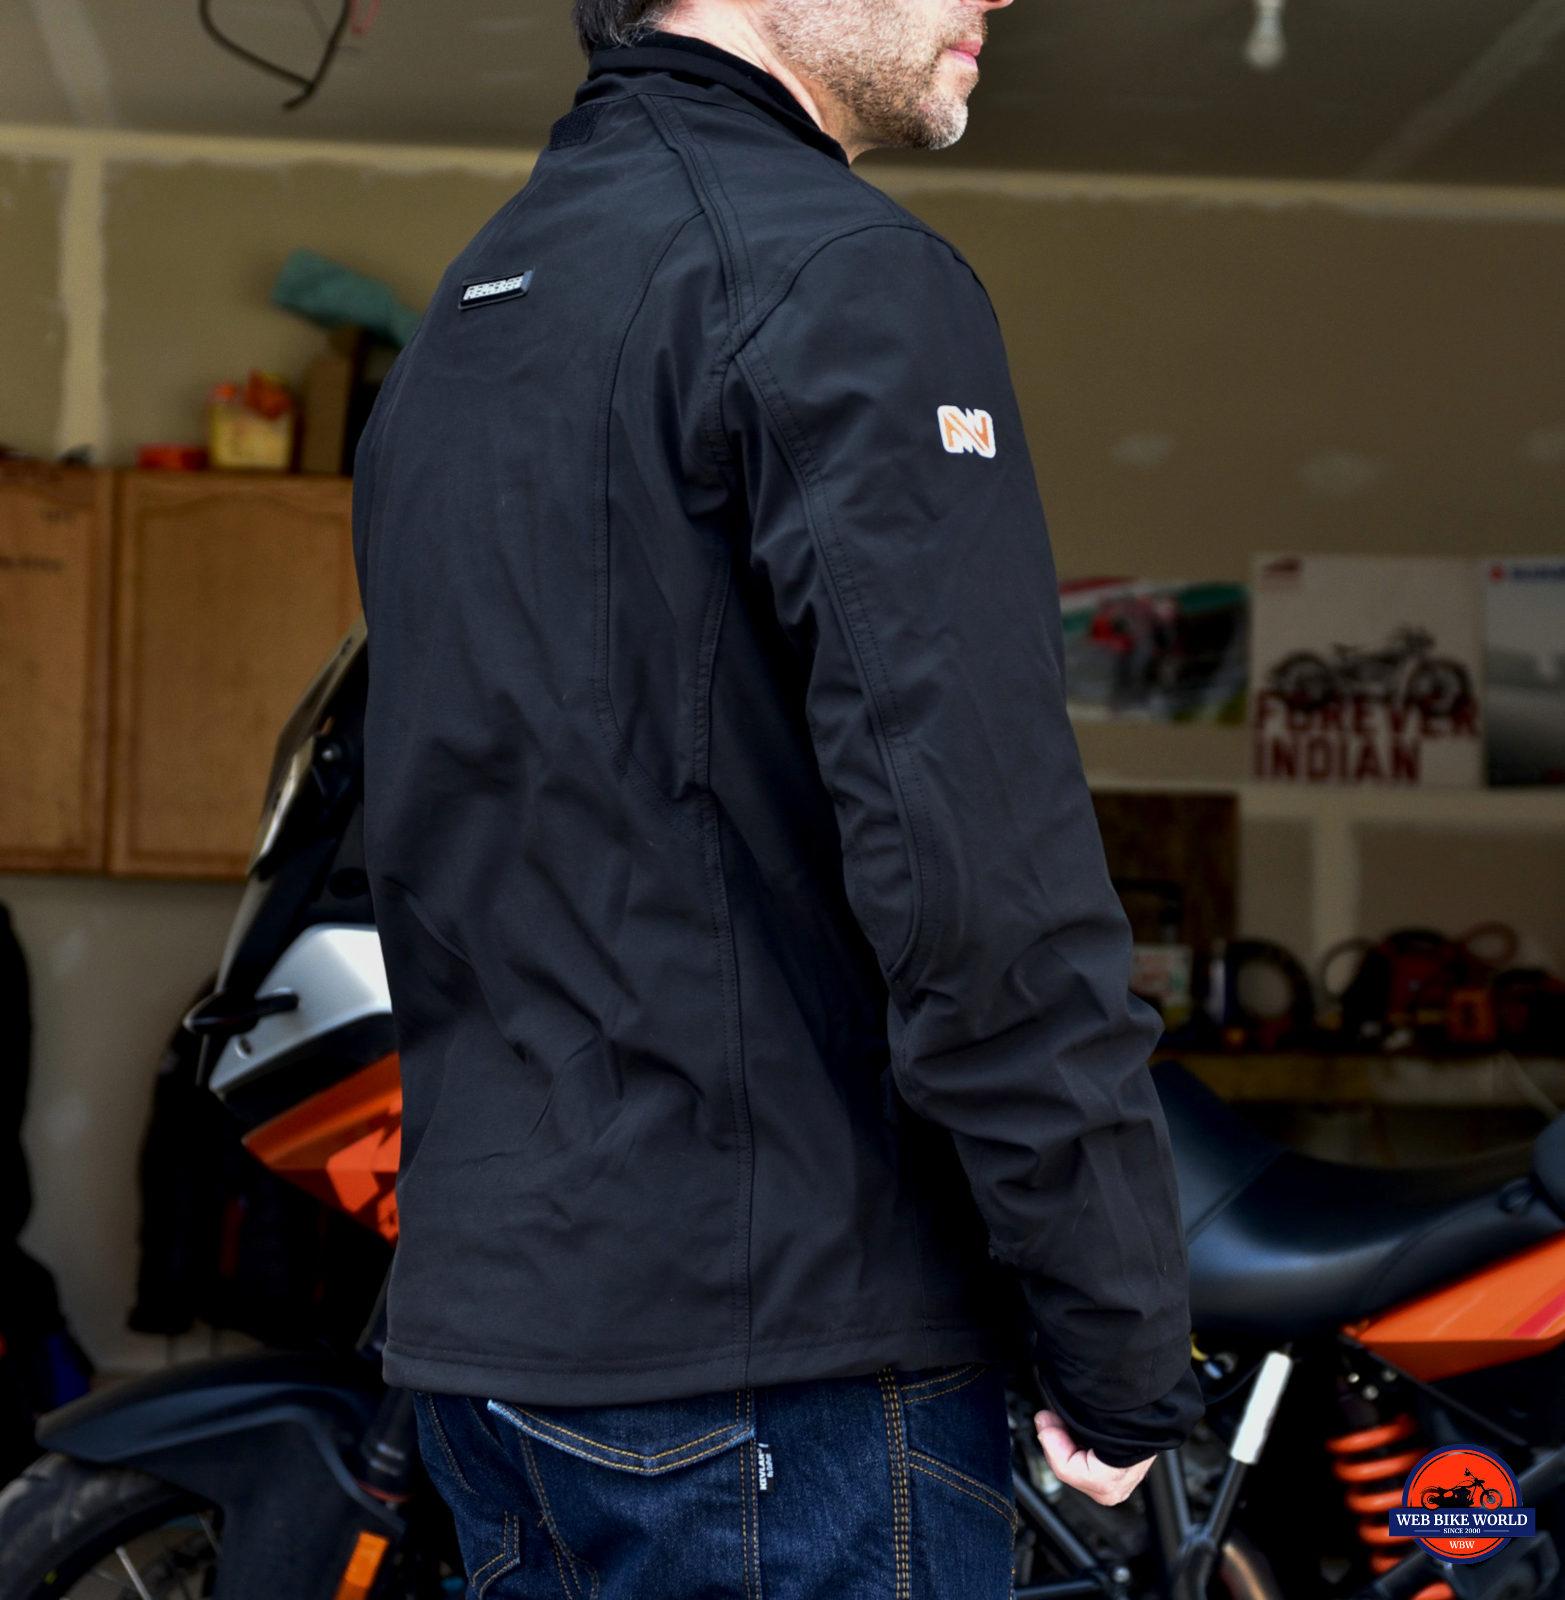 Fieldsheer Hydro Heat Textile Jacket Inner Liner Jacket Back